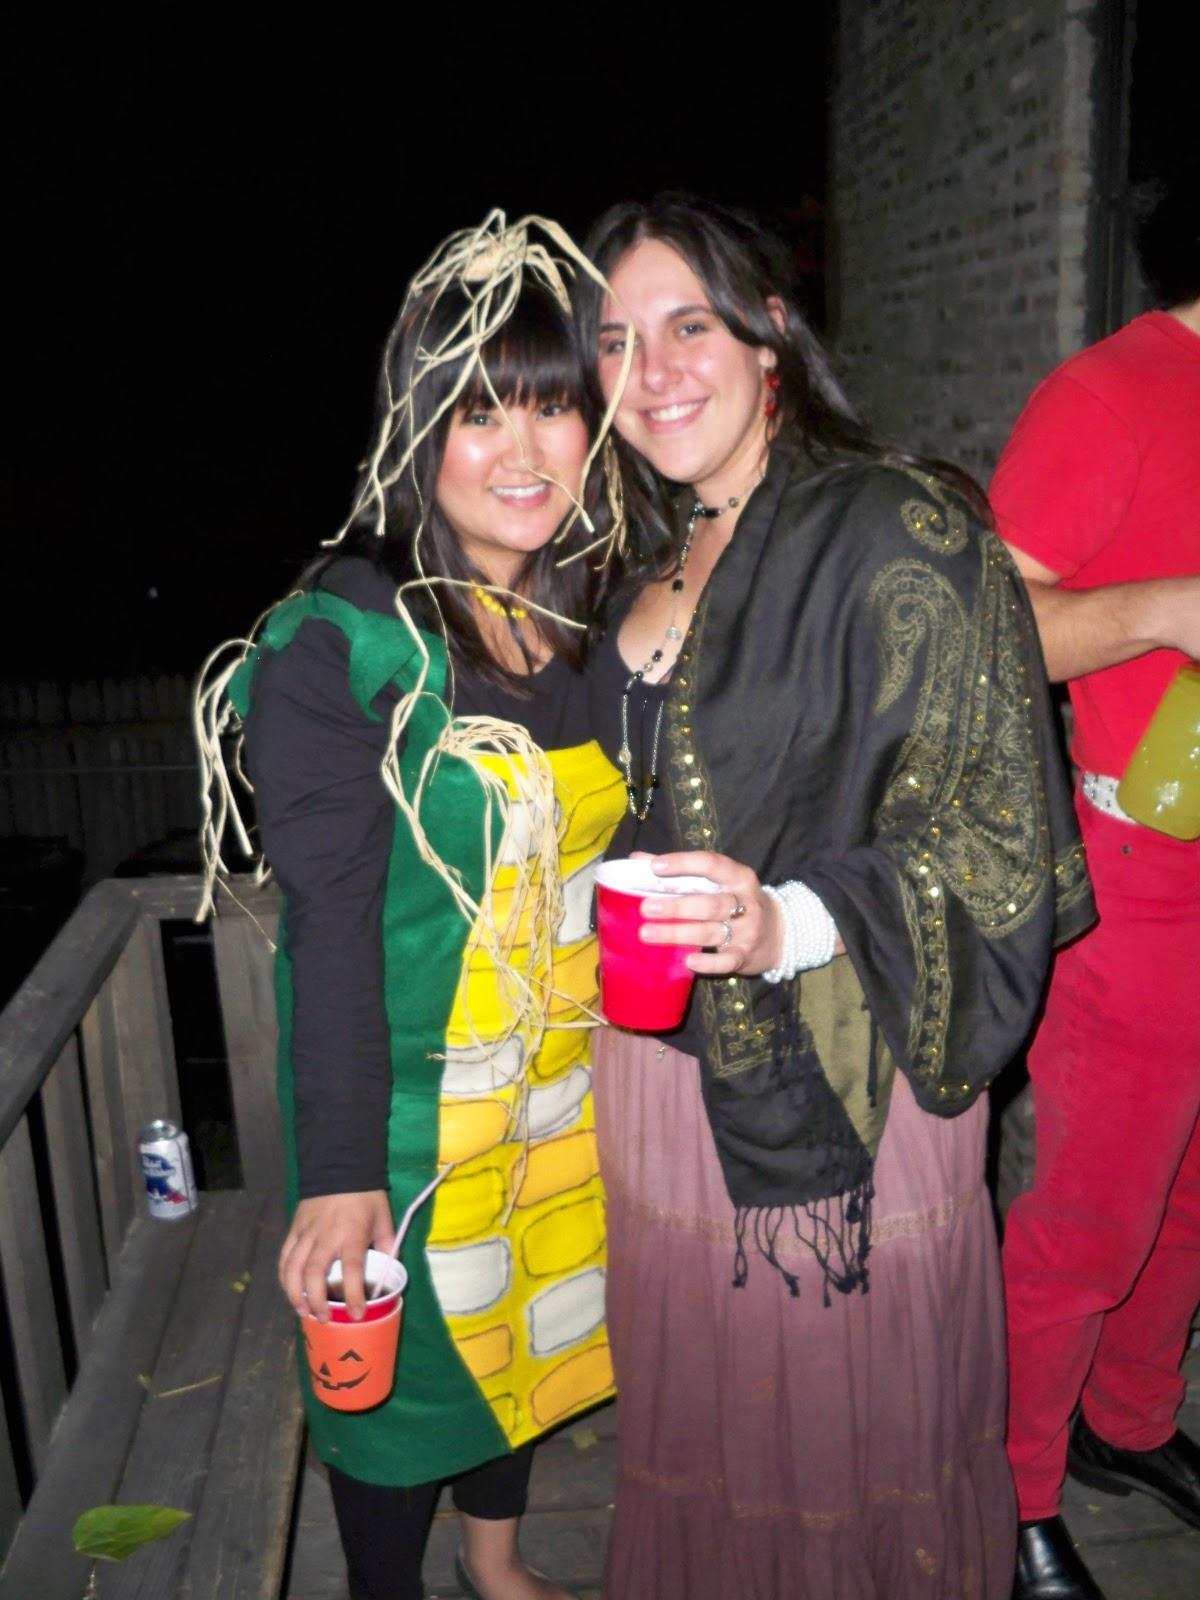 rachelle laughs.: a corny halloween!